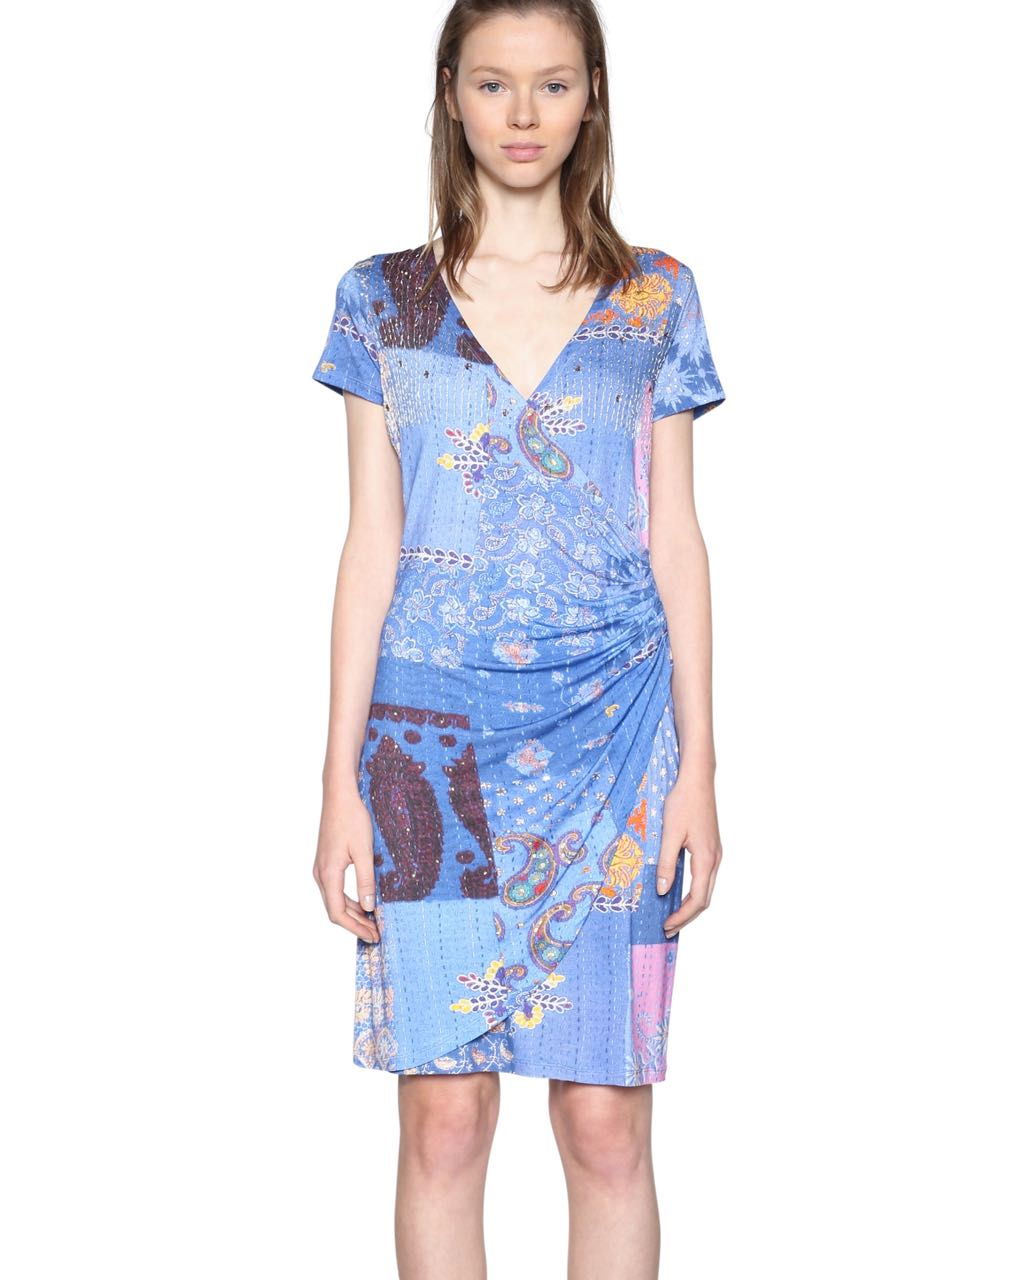 18SWVKBH_5202 Desigual Dress All of Me (blue) Buy Online